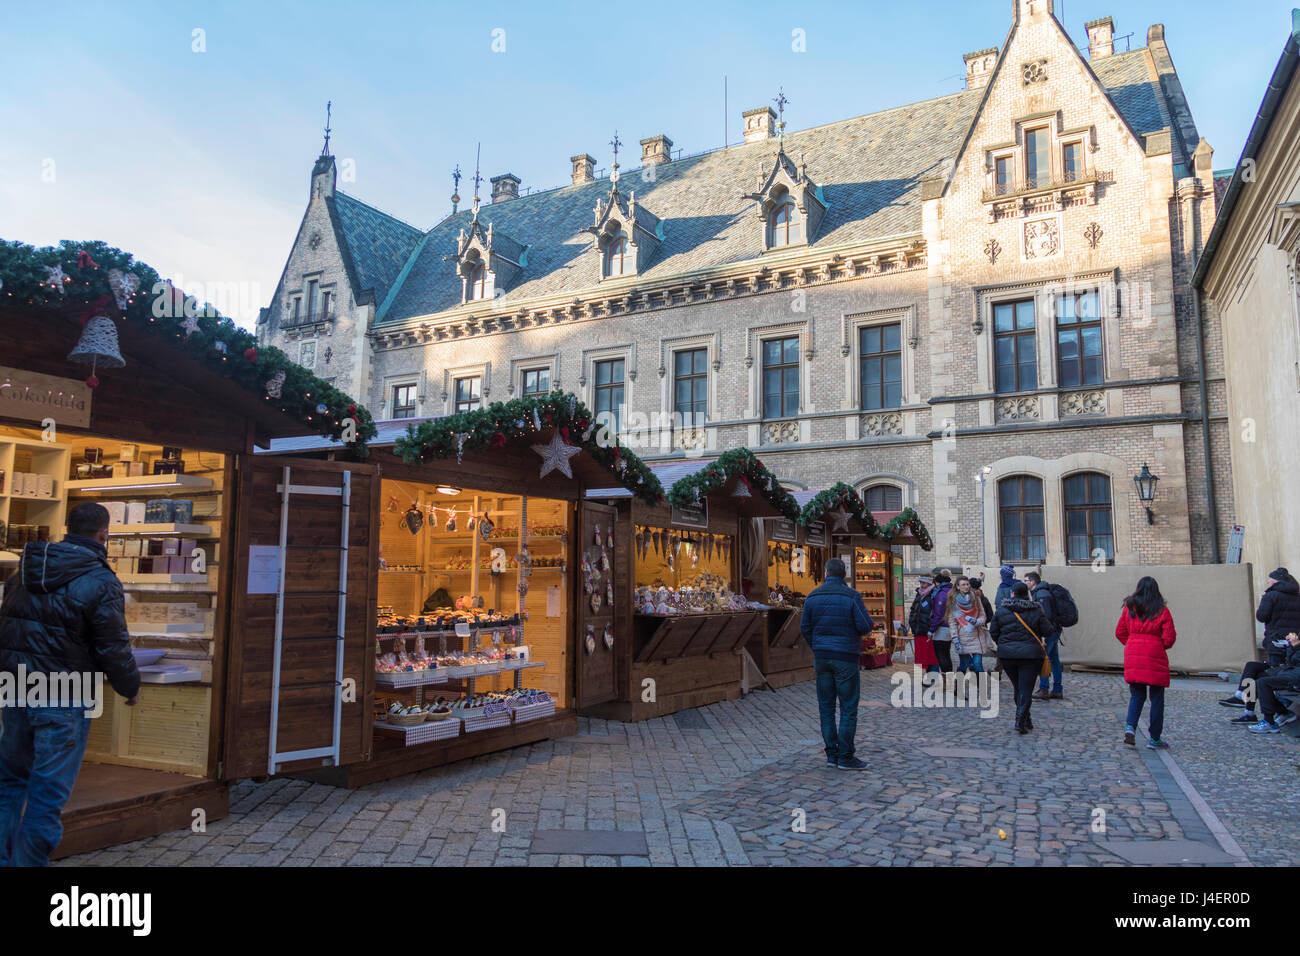 Tourists at the Christmas markets, Prague, Czech Republic, Europe - Stock Image